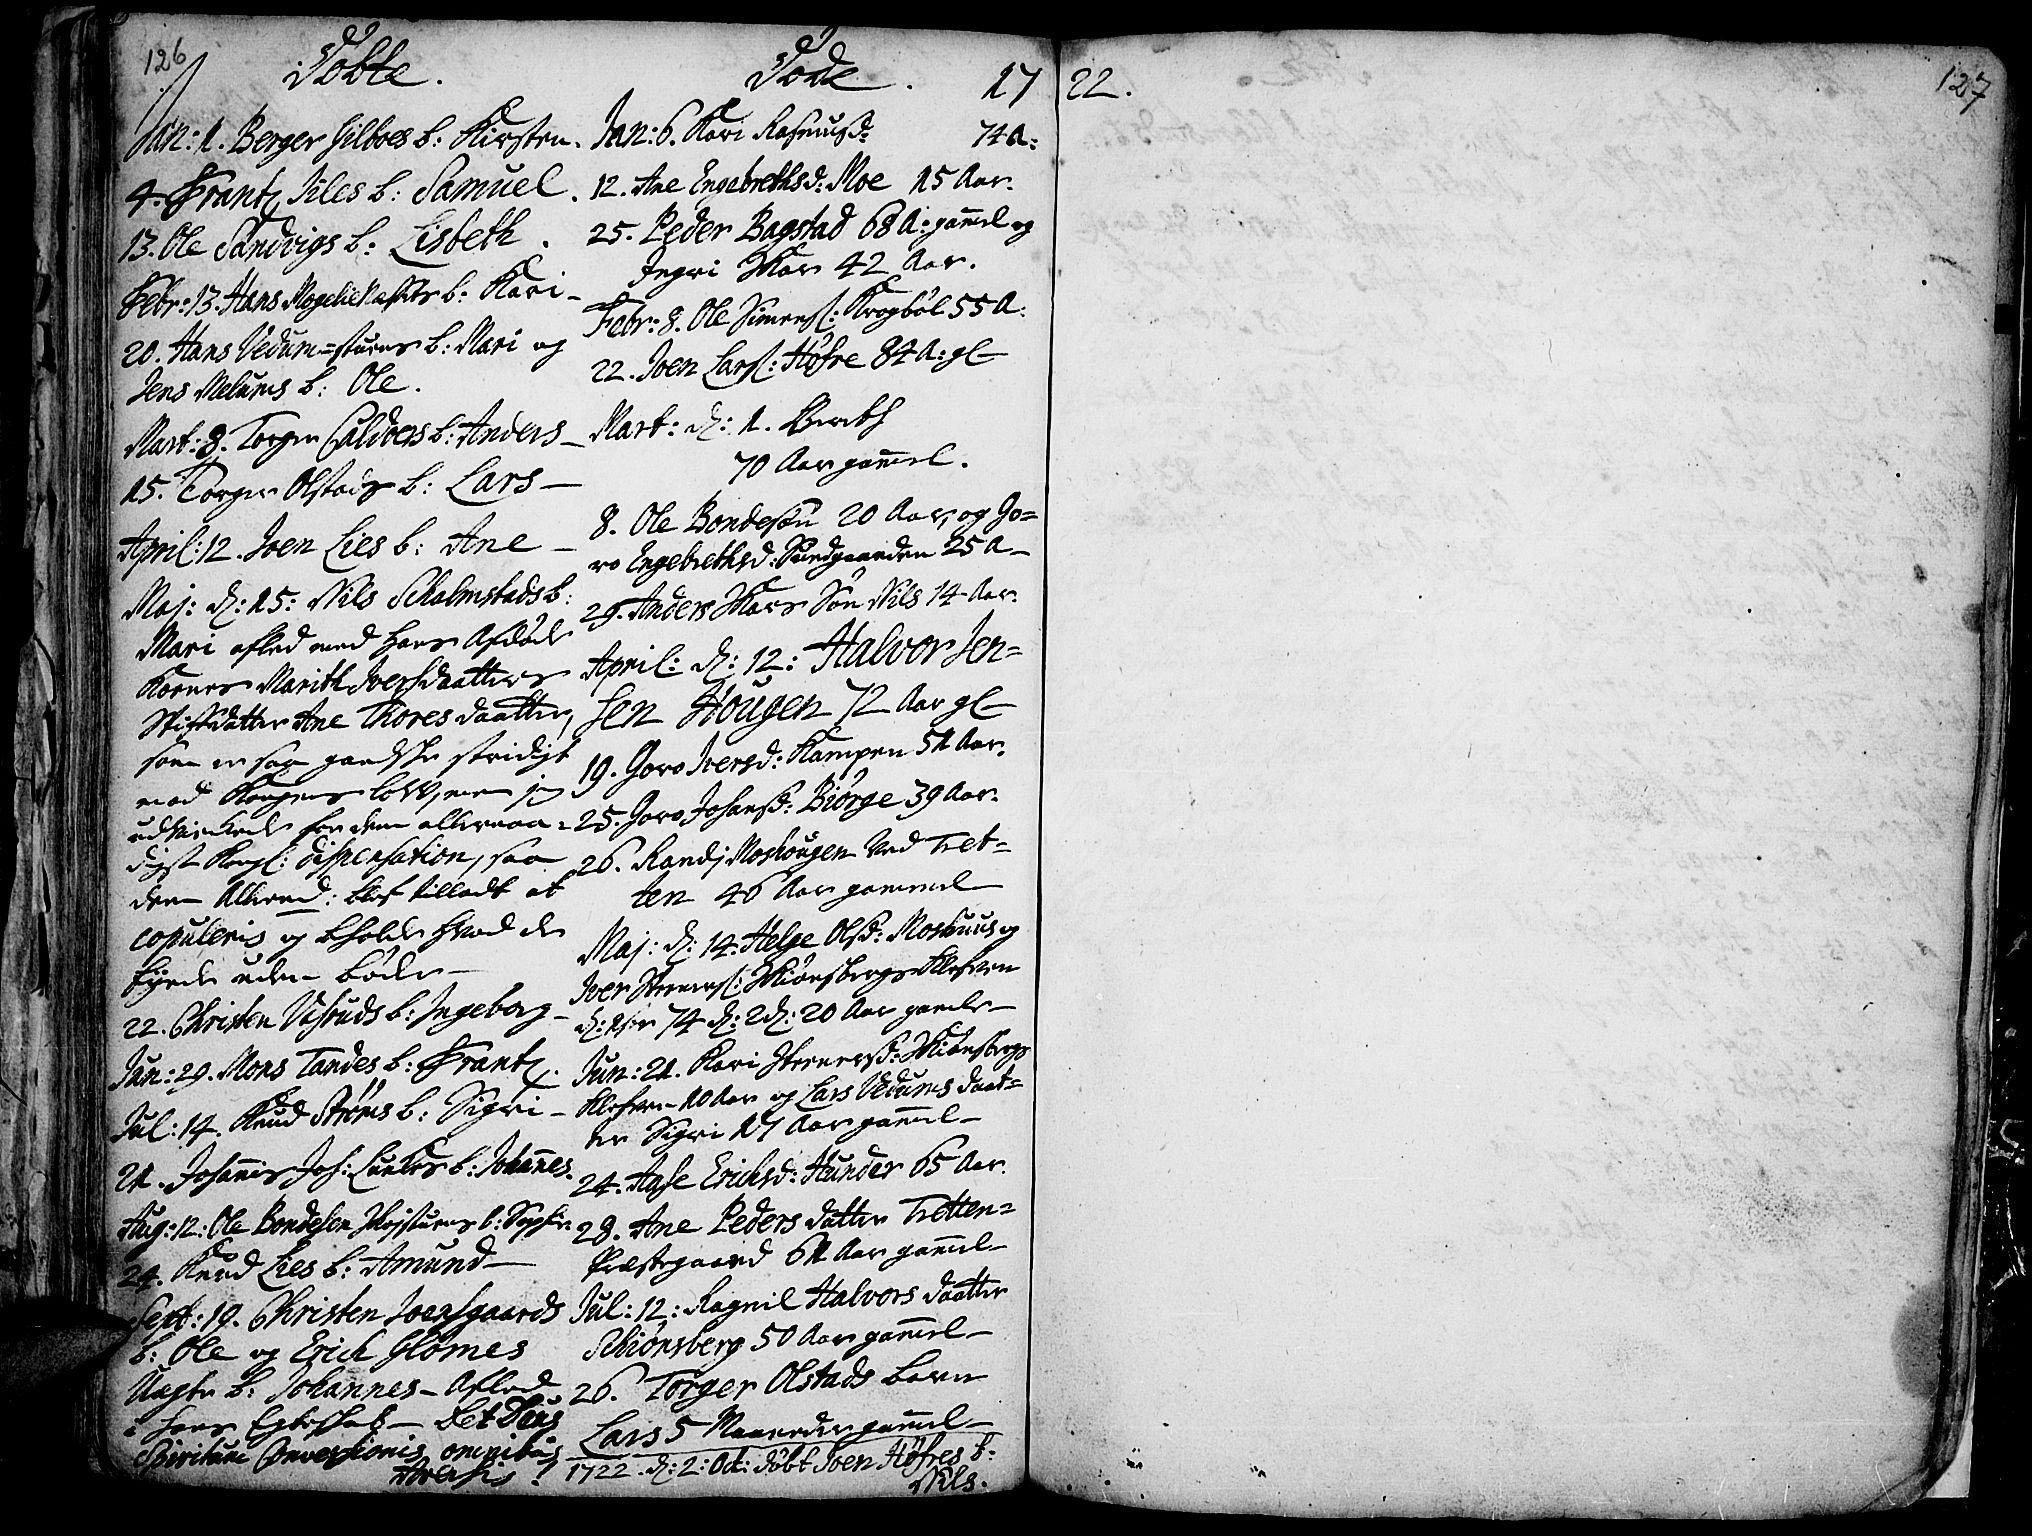 SAH, Øyer prestekontor, Ministerialbok nr. 1, 1671-1727, s. 126-127